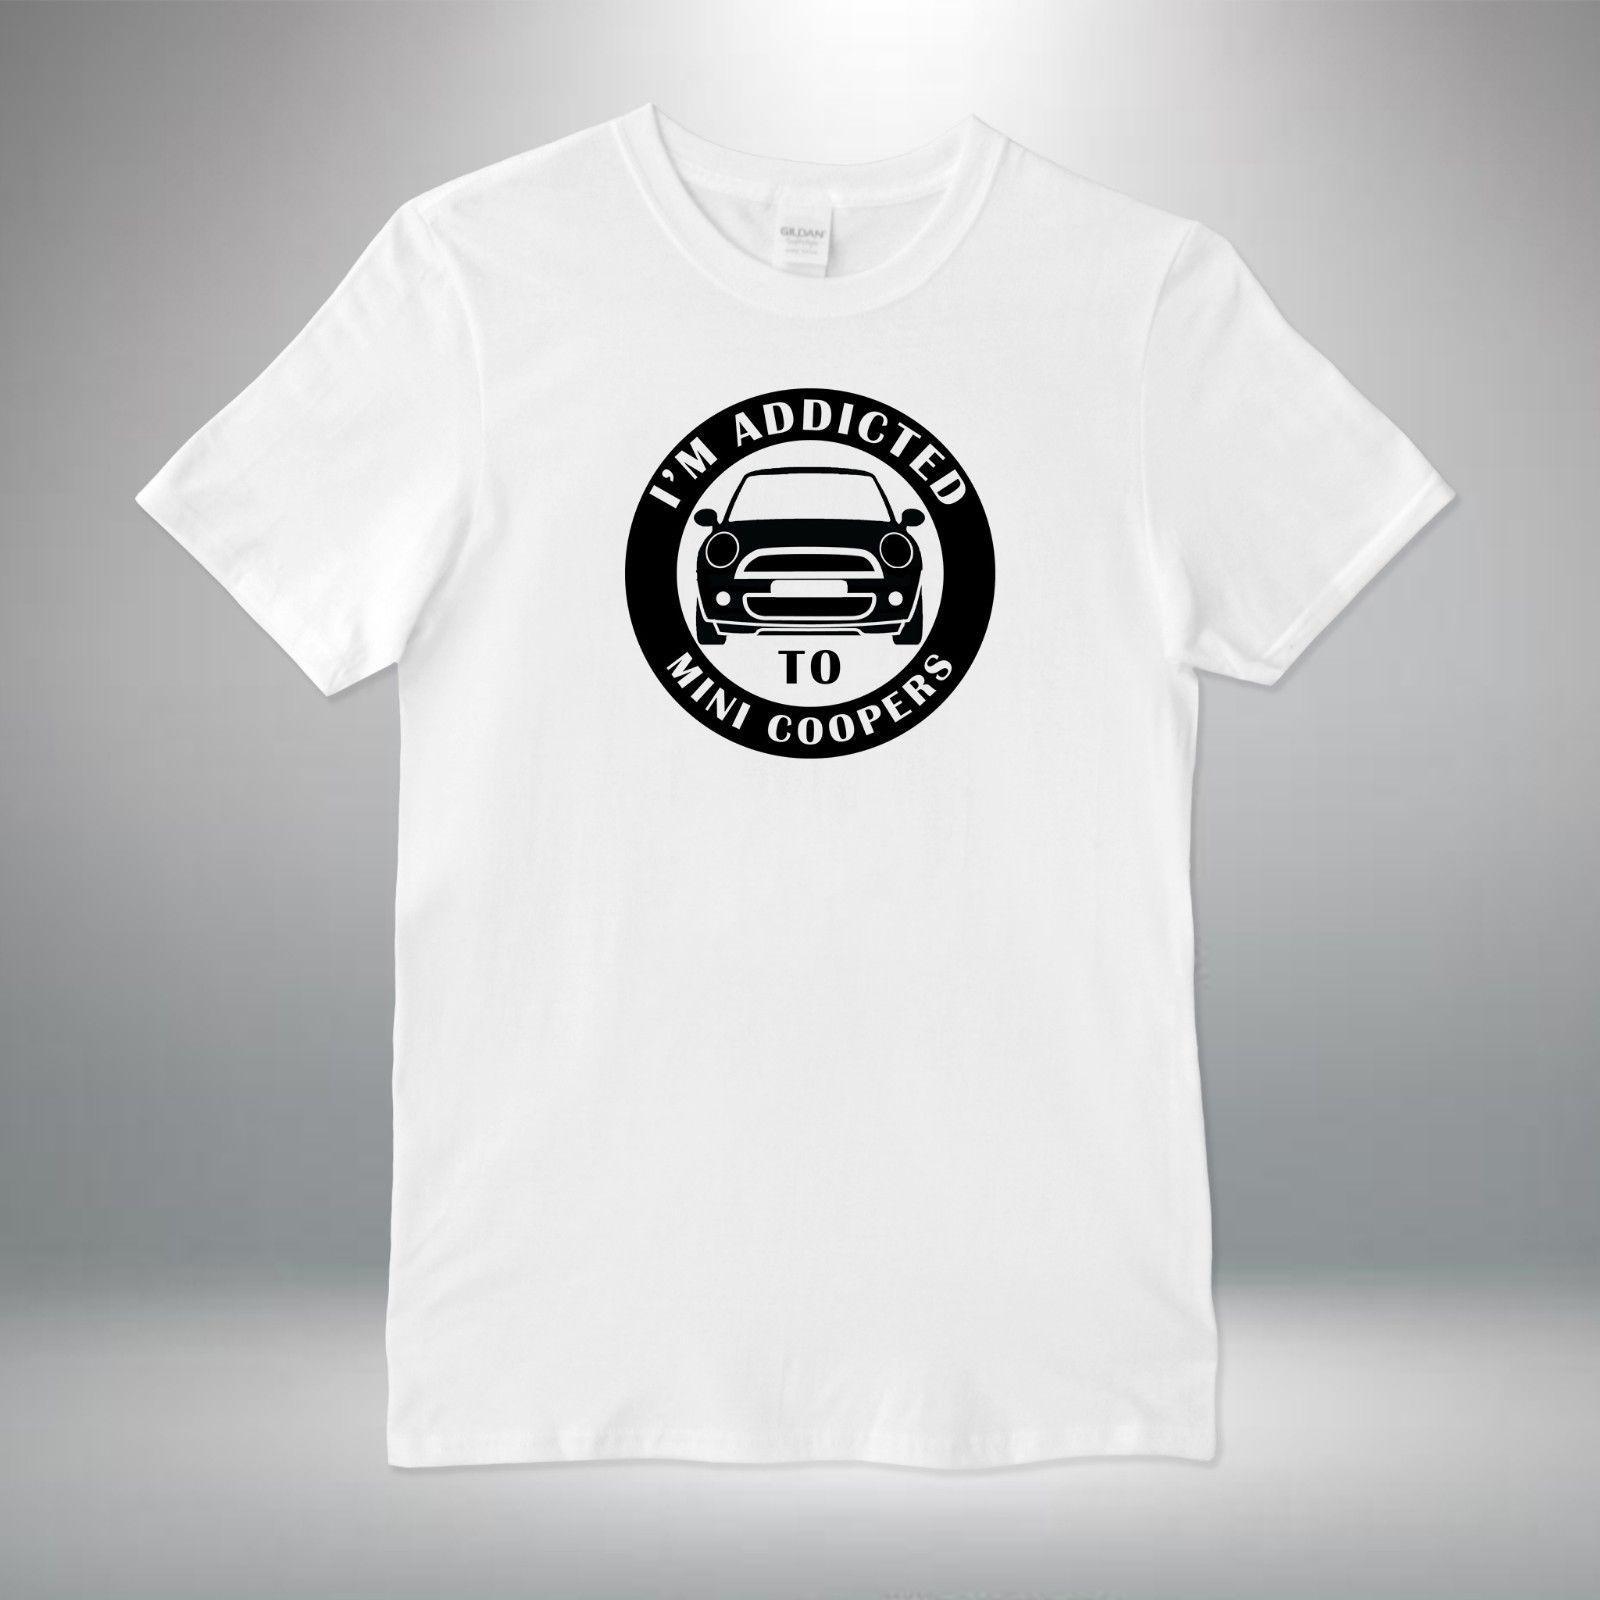 abb3a9ea4 Mini Cooper Addict Classic Cars Vintage T Shirt Vest Tank Top Men Women  Unisex Funky Tee Shirts Humor T Shirt From Belief85, $11.48| DHgate.Com